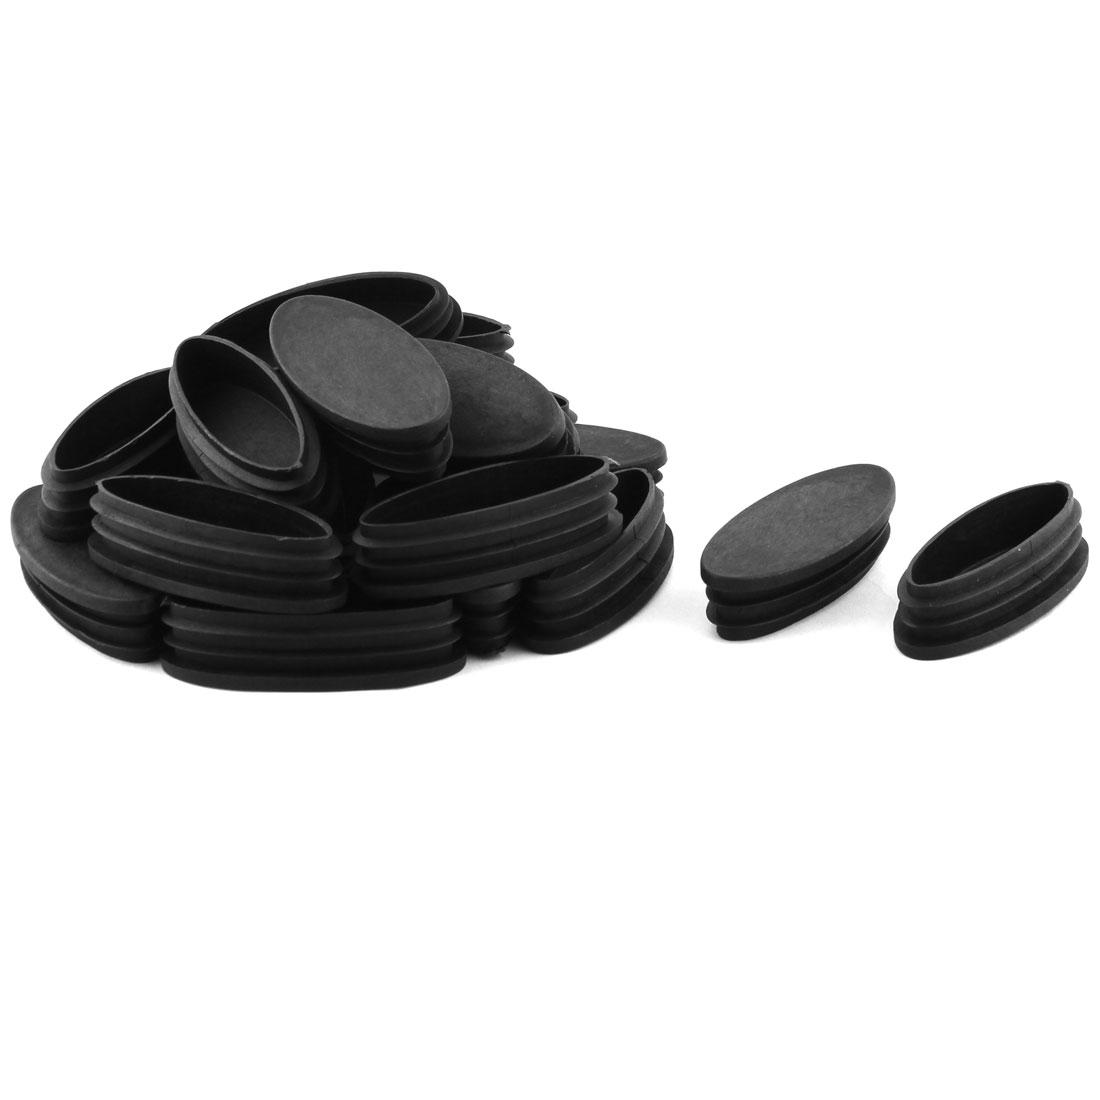 Furniture Table Chair Feet Plastic Oval Tube Insert Cap Black 80 x 35mm 20 Pcs